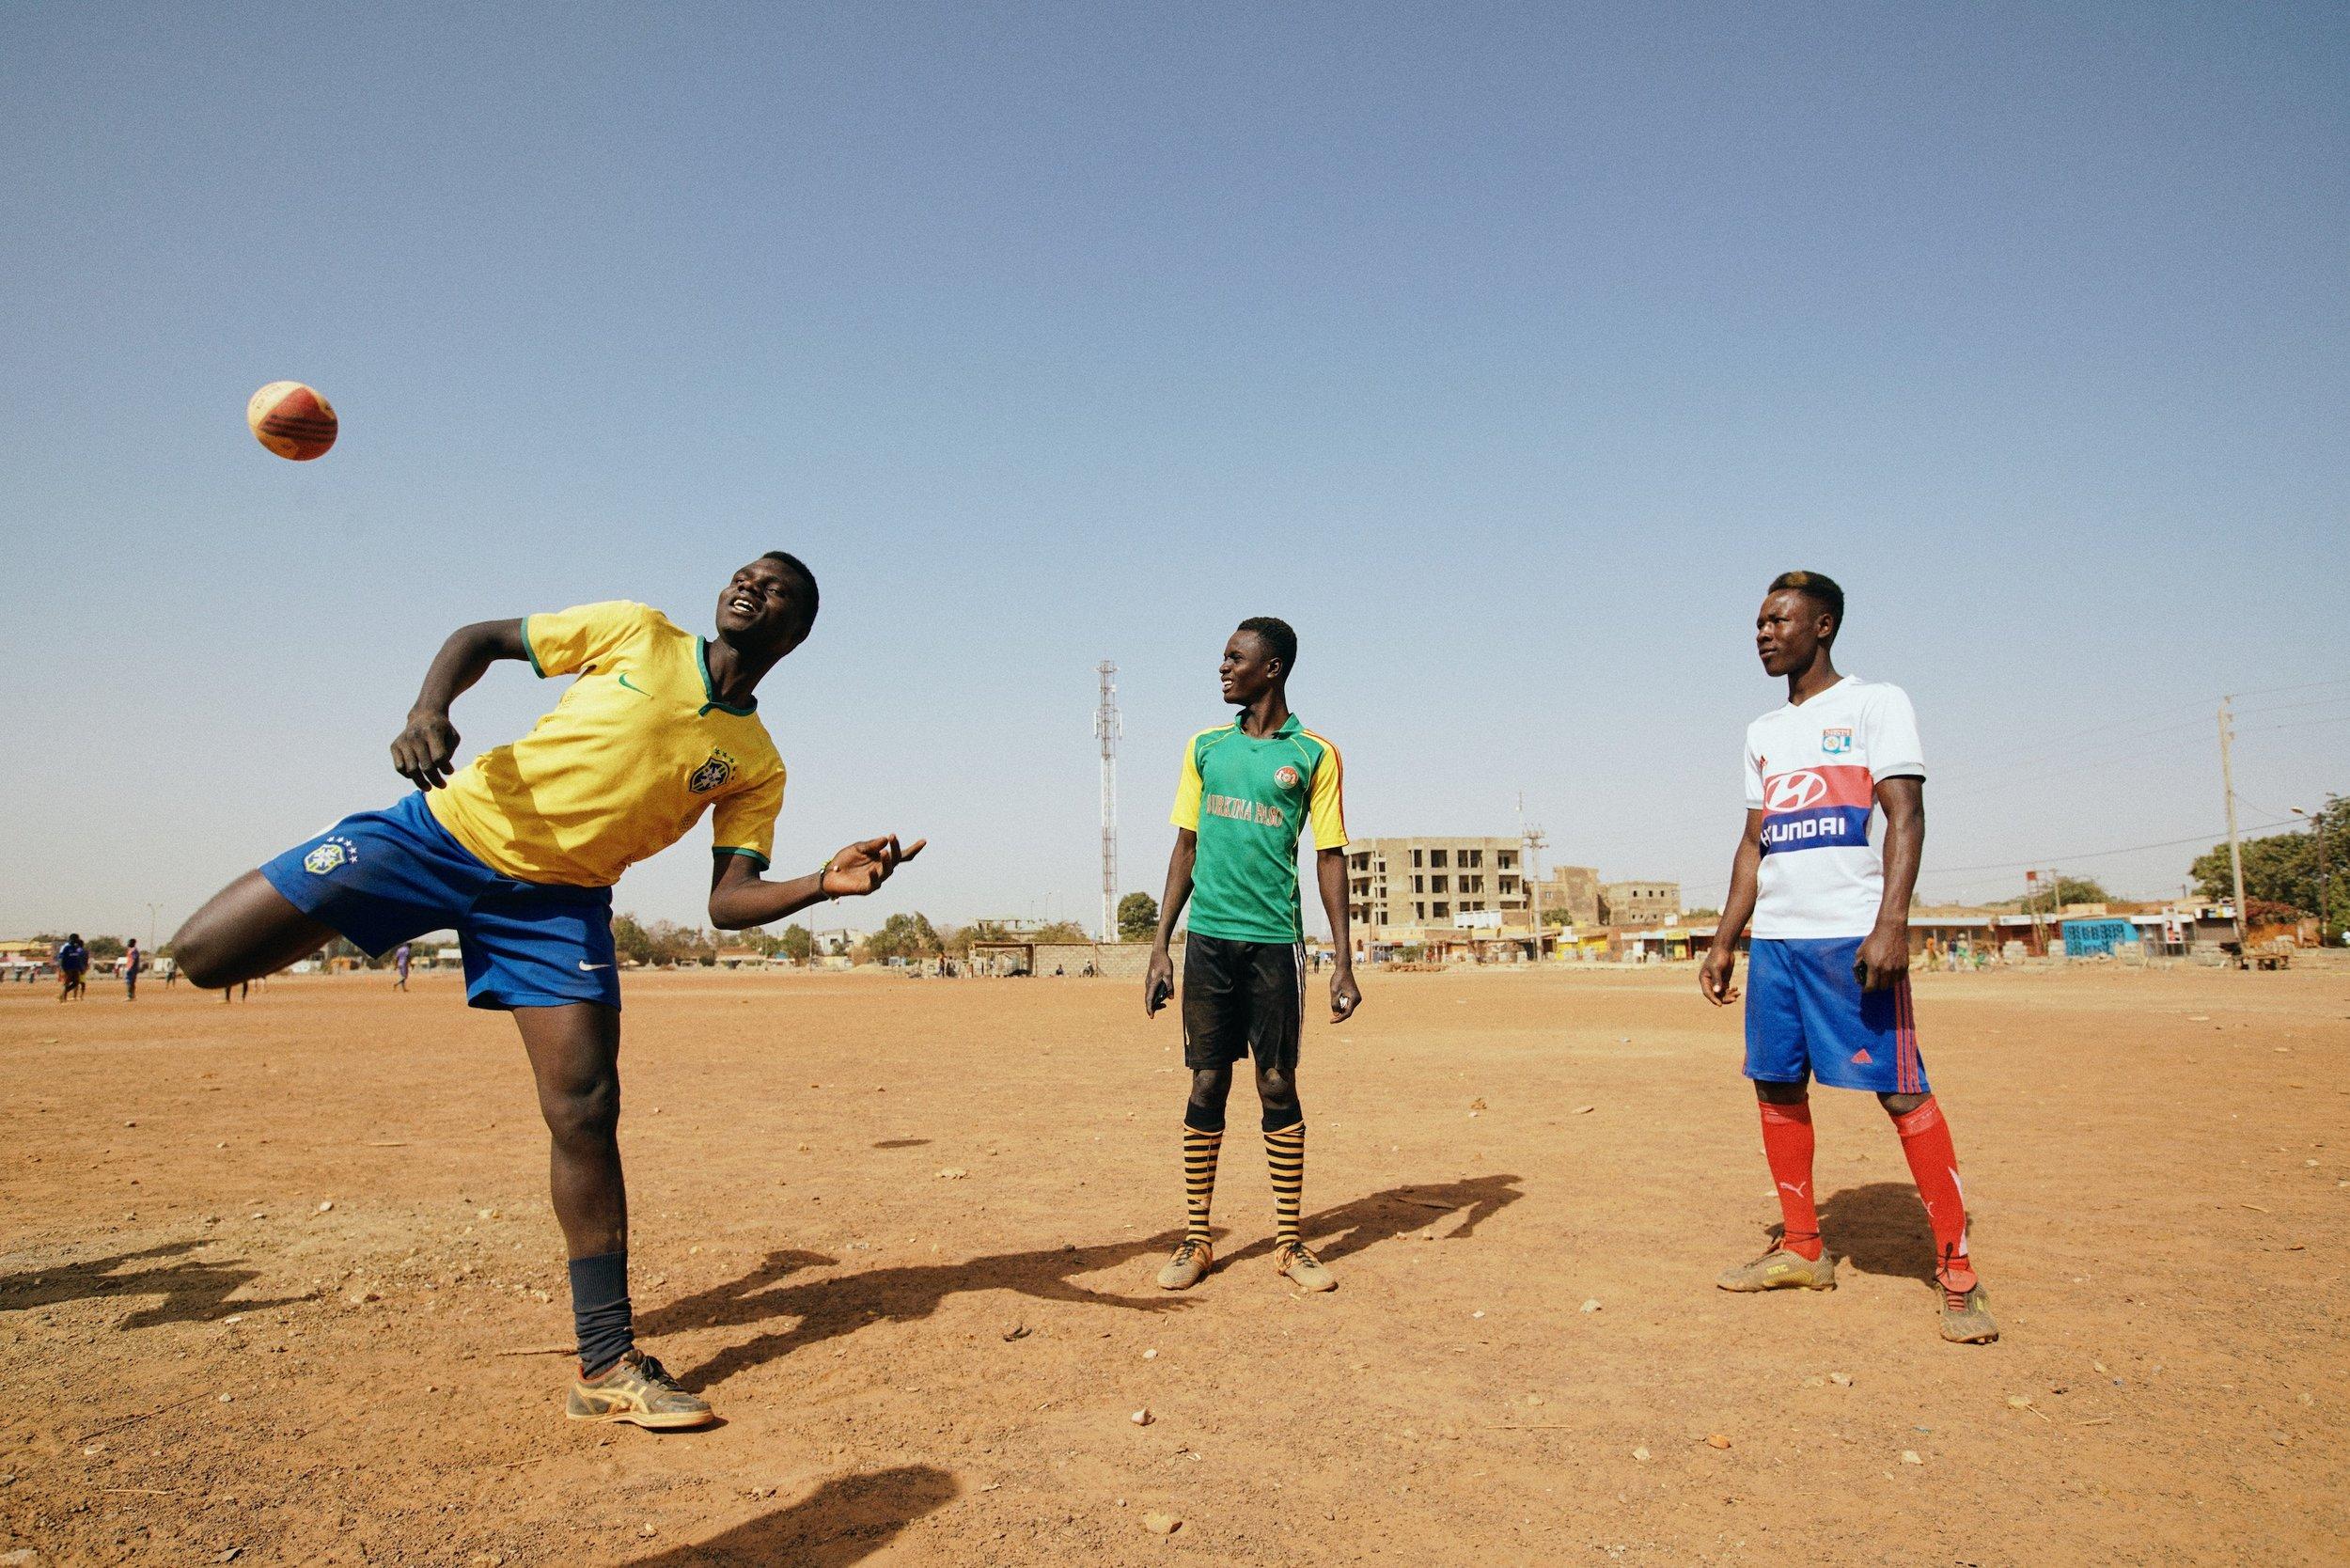 Stockdale_Ouagadougou14.jpg